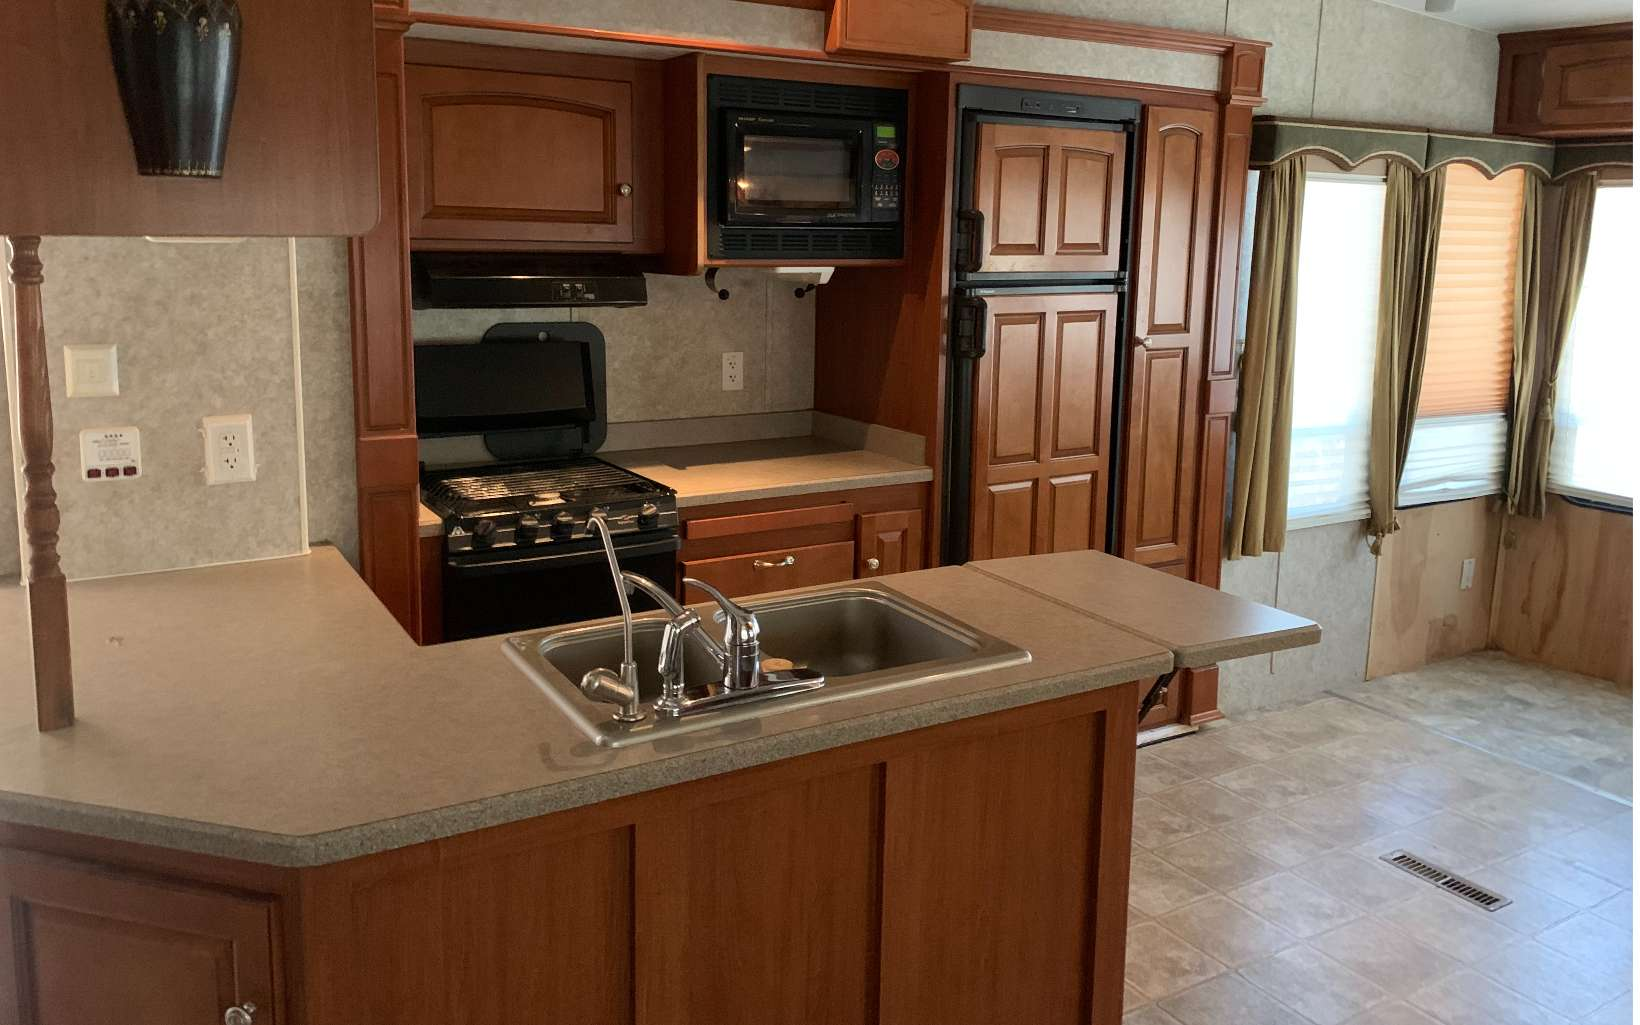 65 2ND ST, Ellijay, Georgia 30540, 1 Bedroom Bedrooms, ,1 BathroomBathrooms,Single Family,For Sale,65 2ND ST,304319